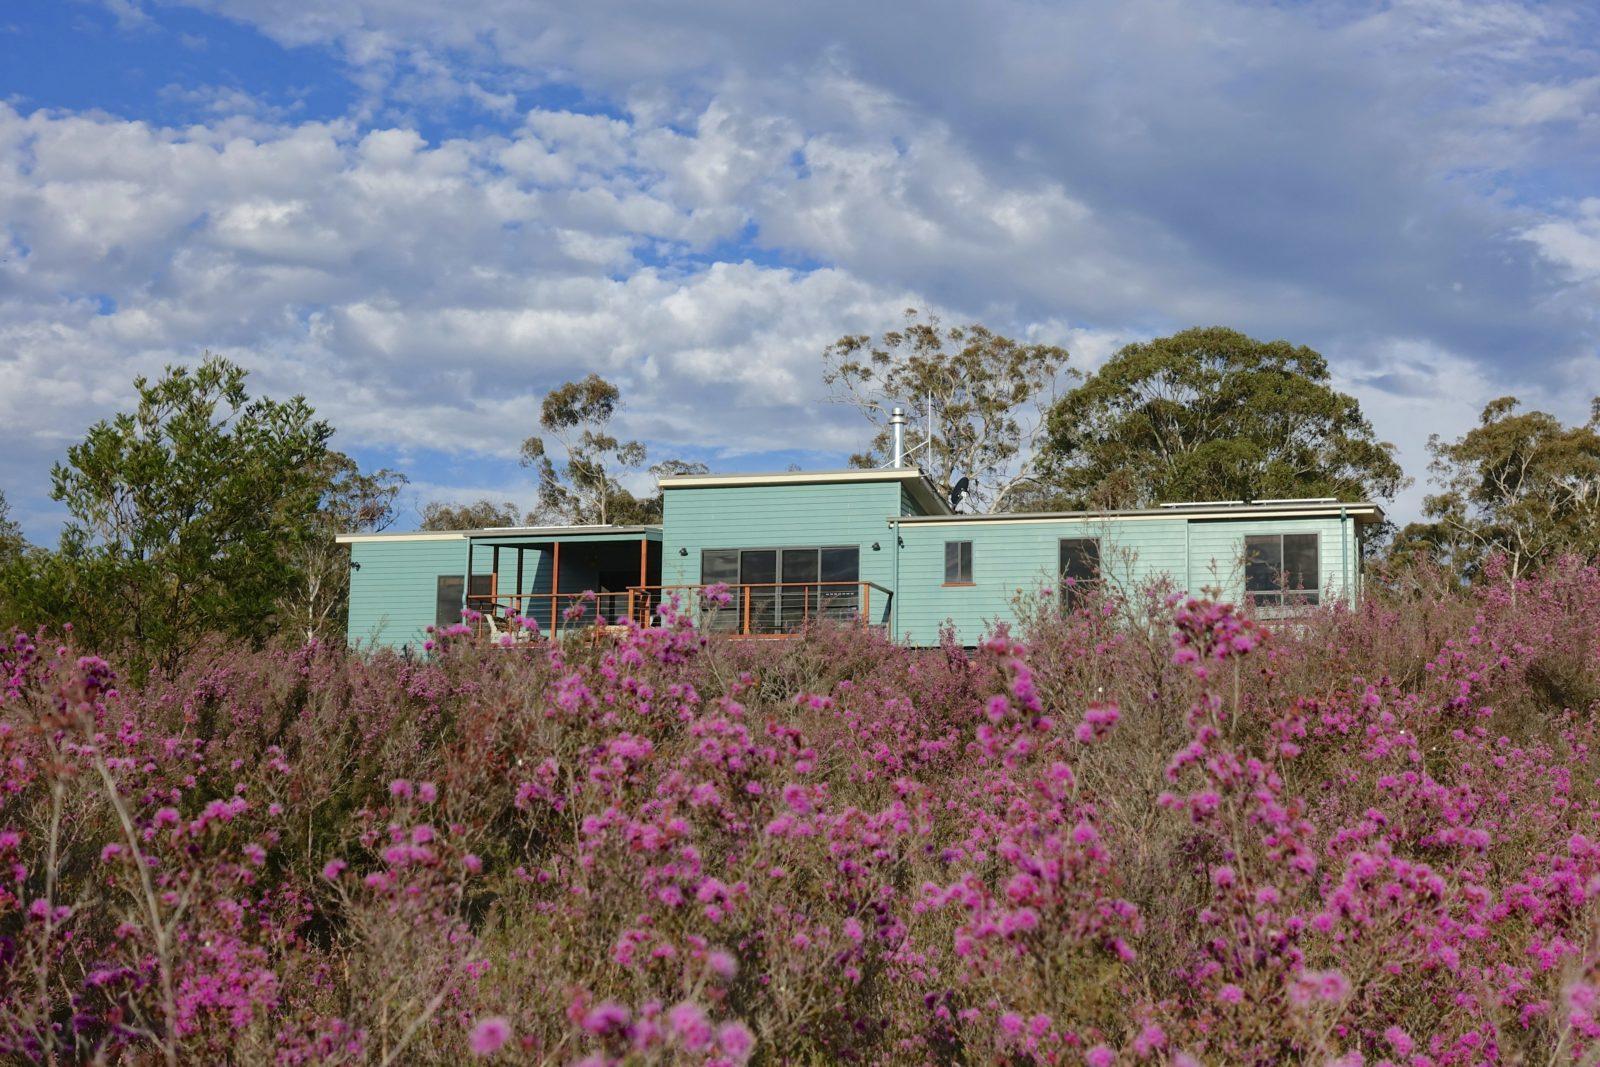 Tea Tree Hollow Holiday Rental House Weekender Getaway Southern Highland Canyonleigh Brayton Marulan